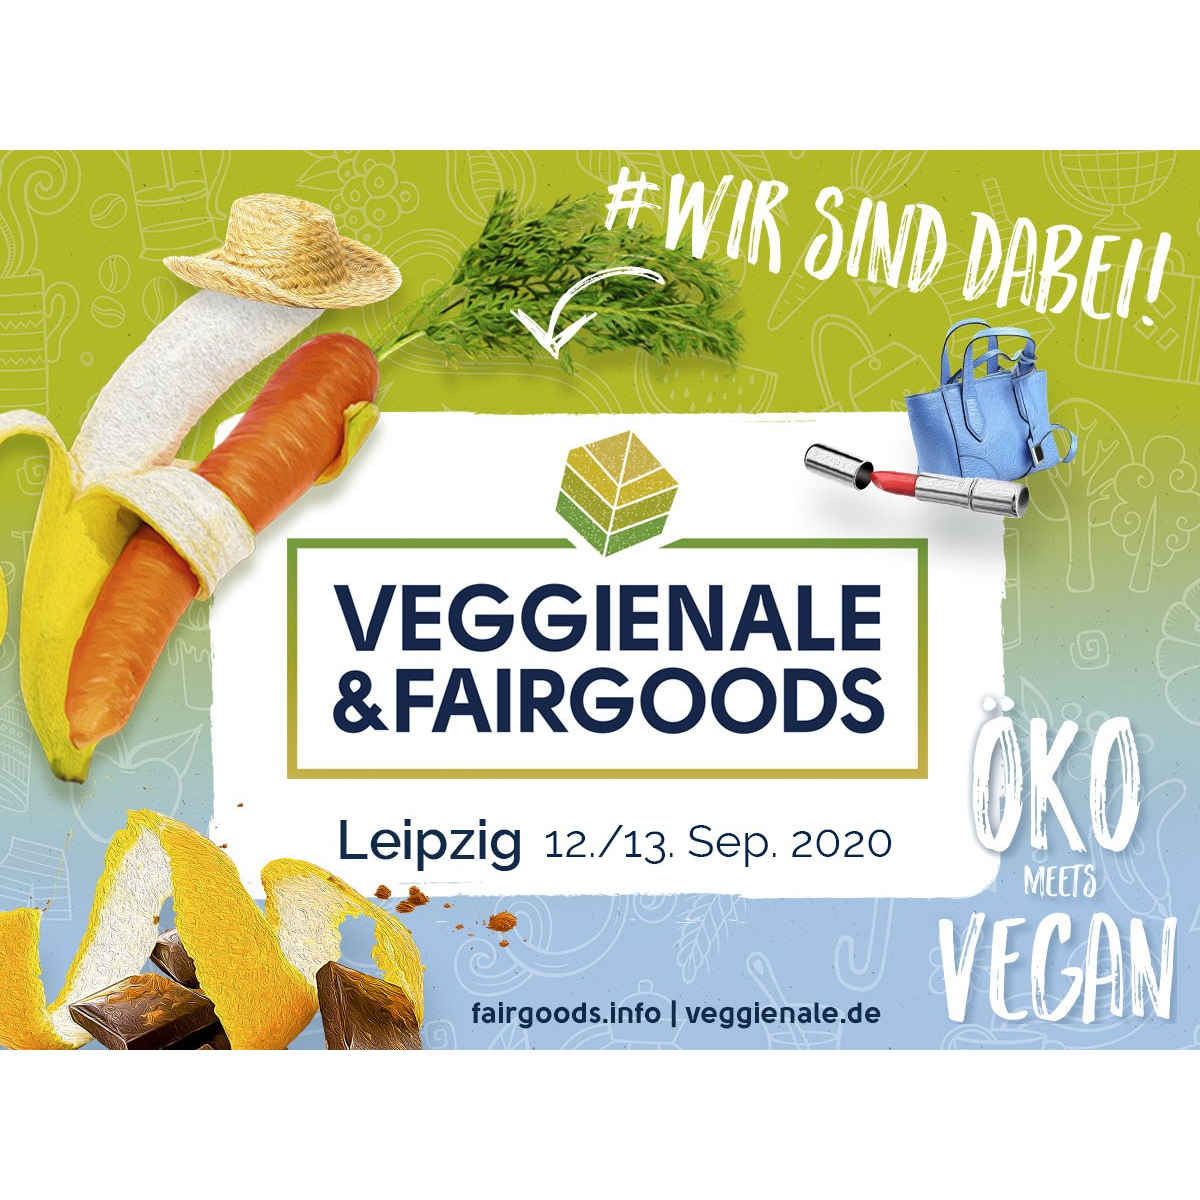 ARIWA Chemnitz goes Veggienale & Fairgoods Leipzig